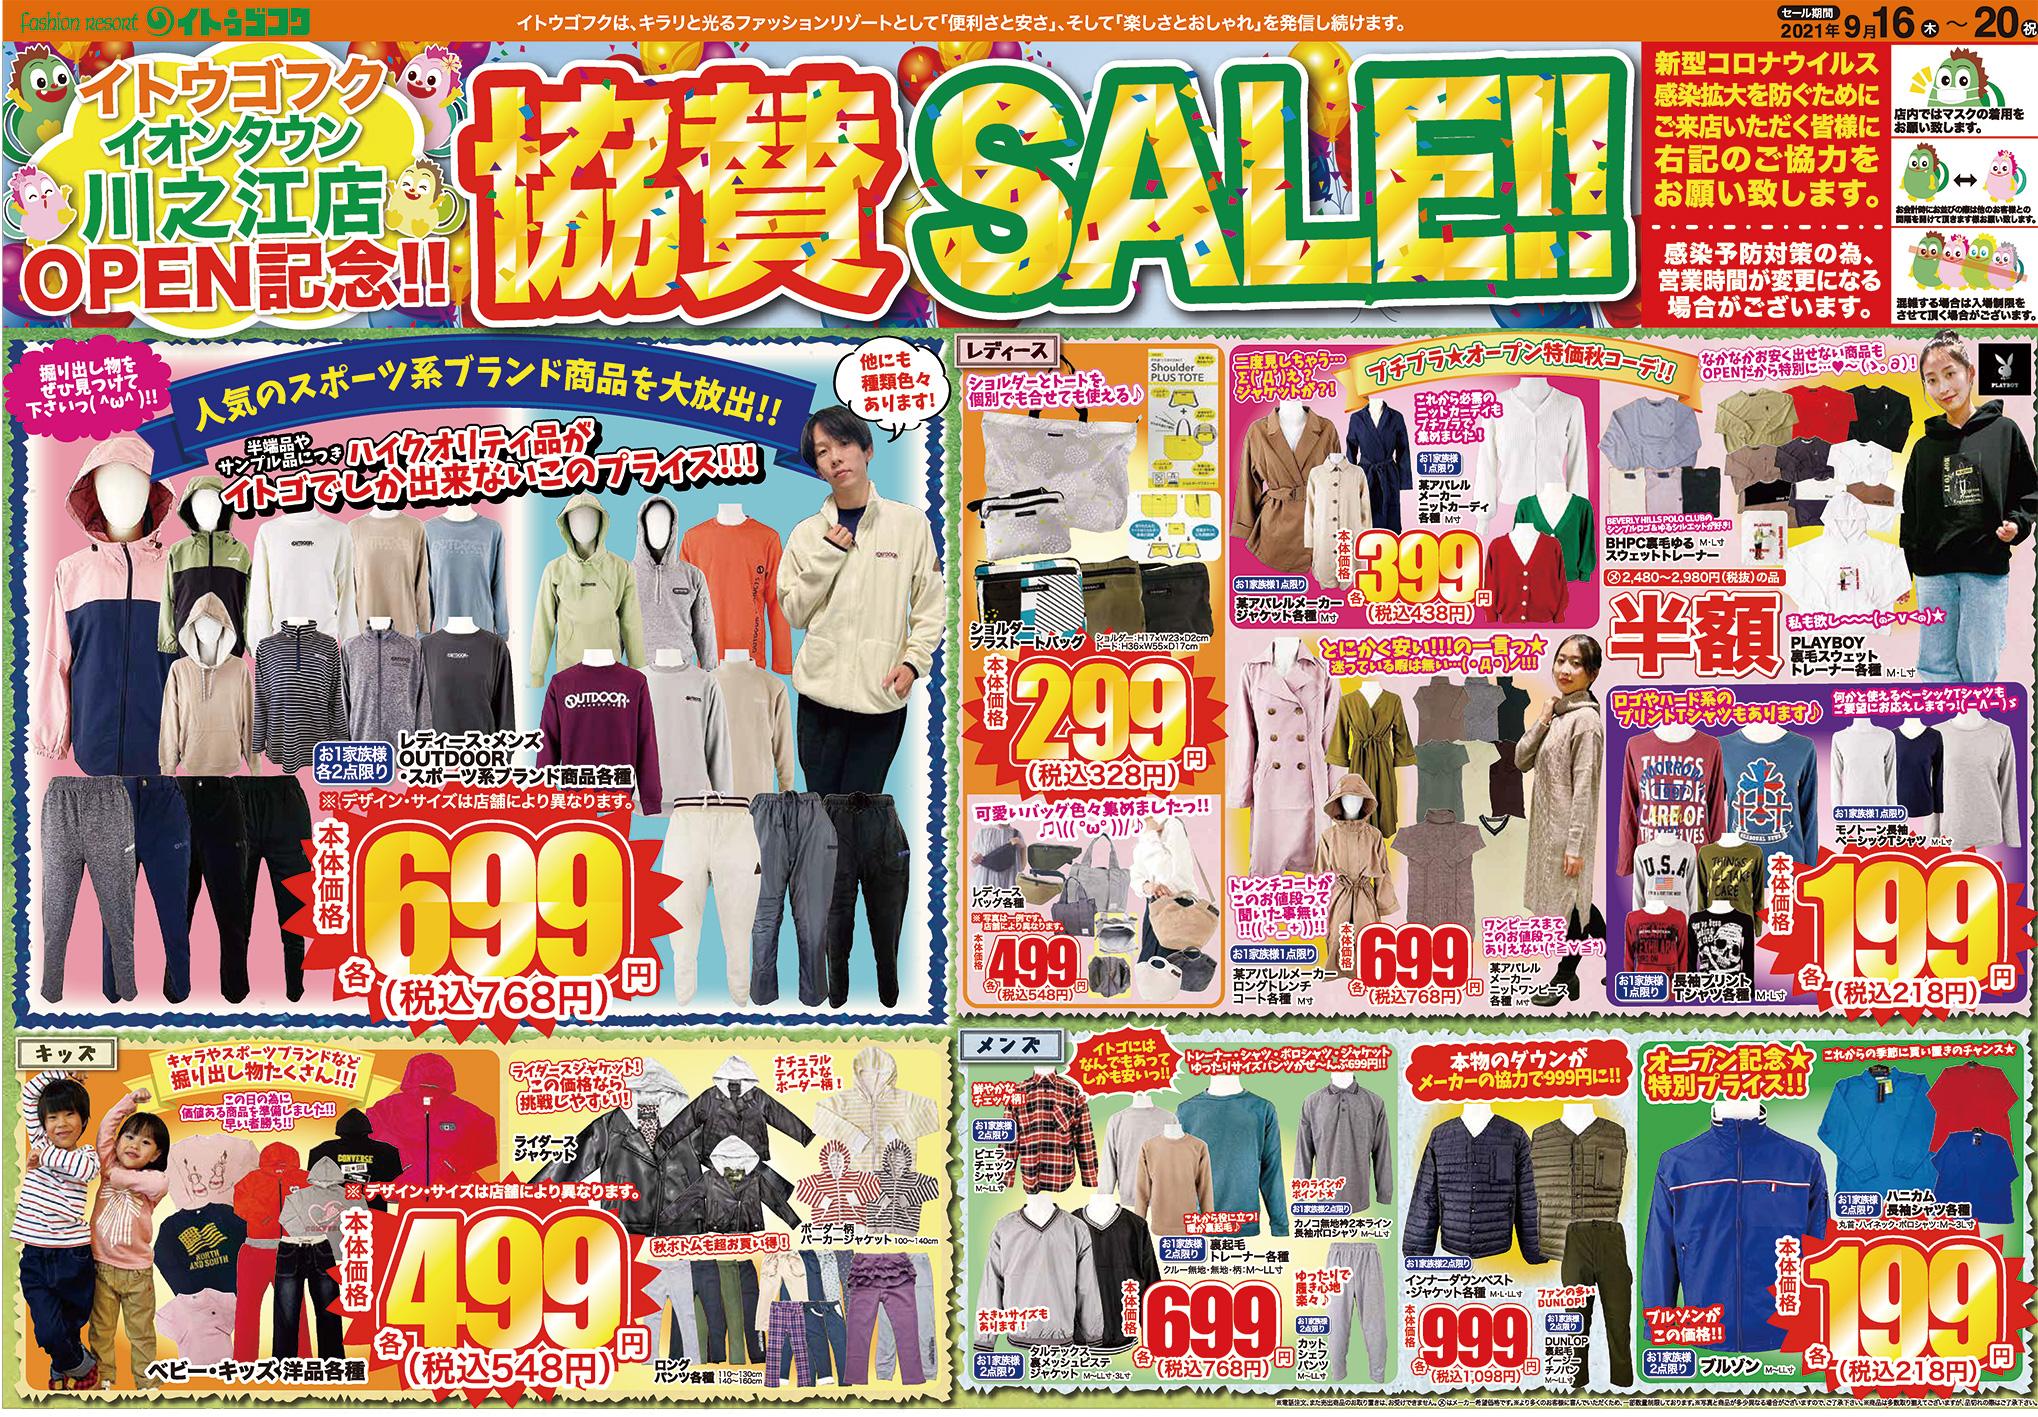 9月16日(木)〜20日(祝)「川之江店OPEN&全店協賛セール」